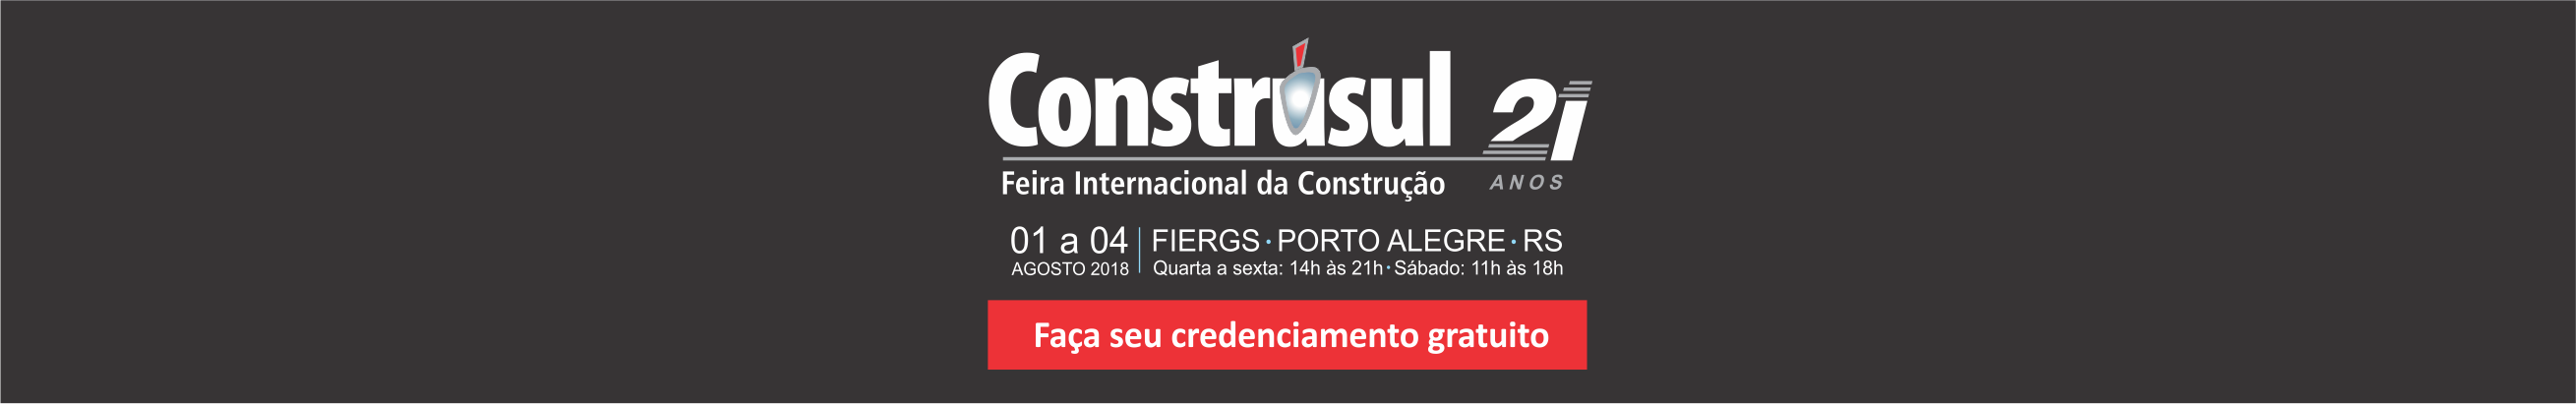 Banner-site_Construsul